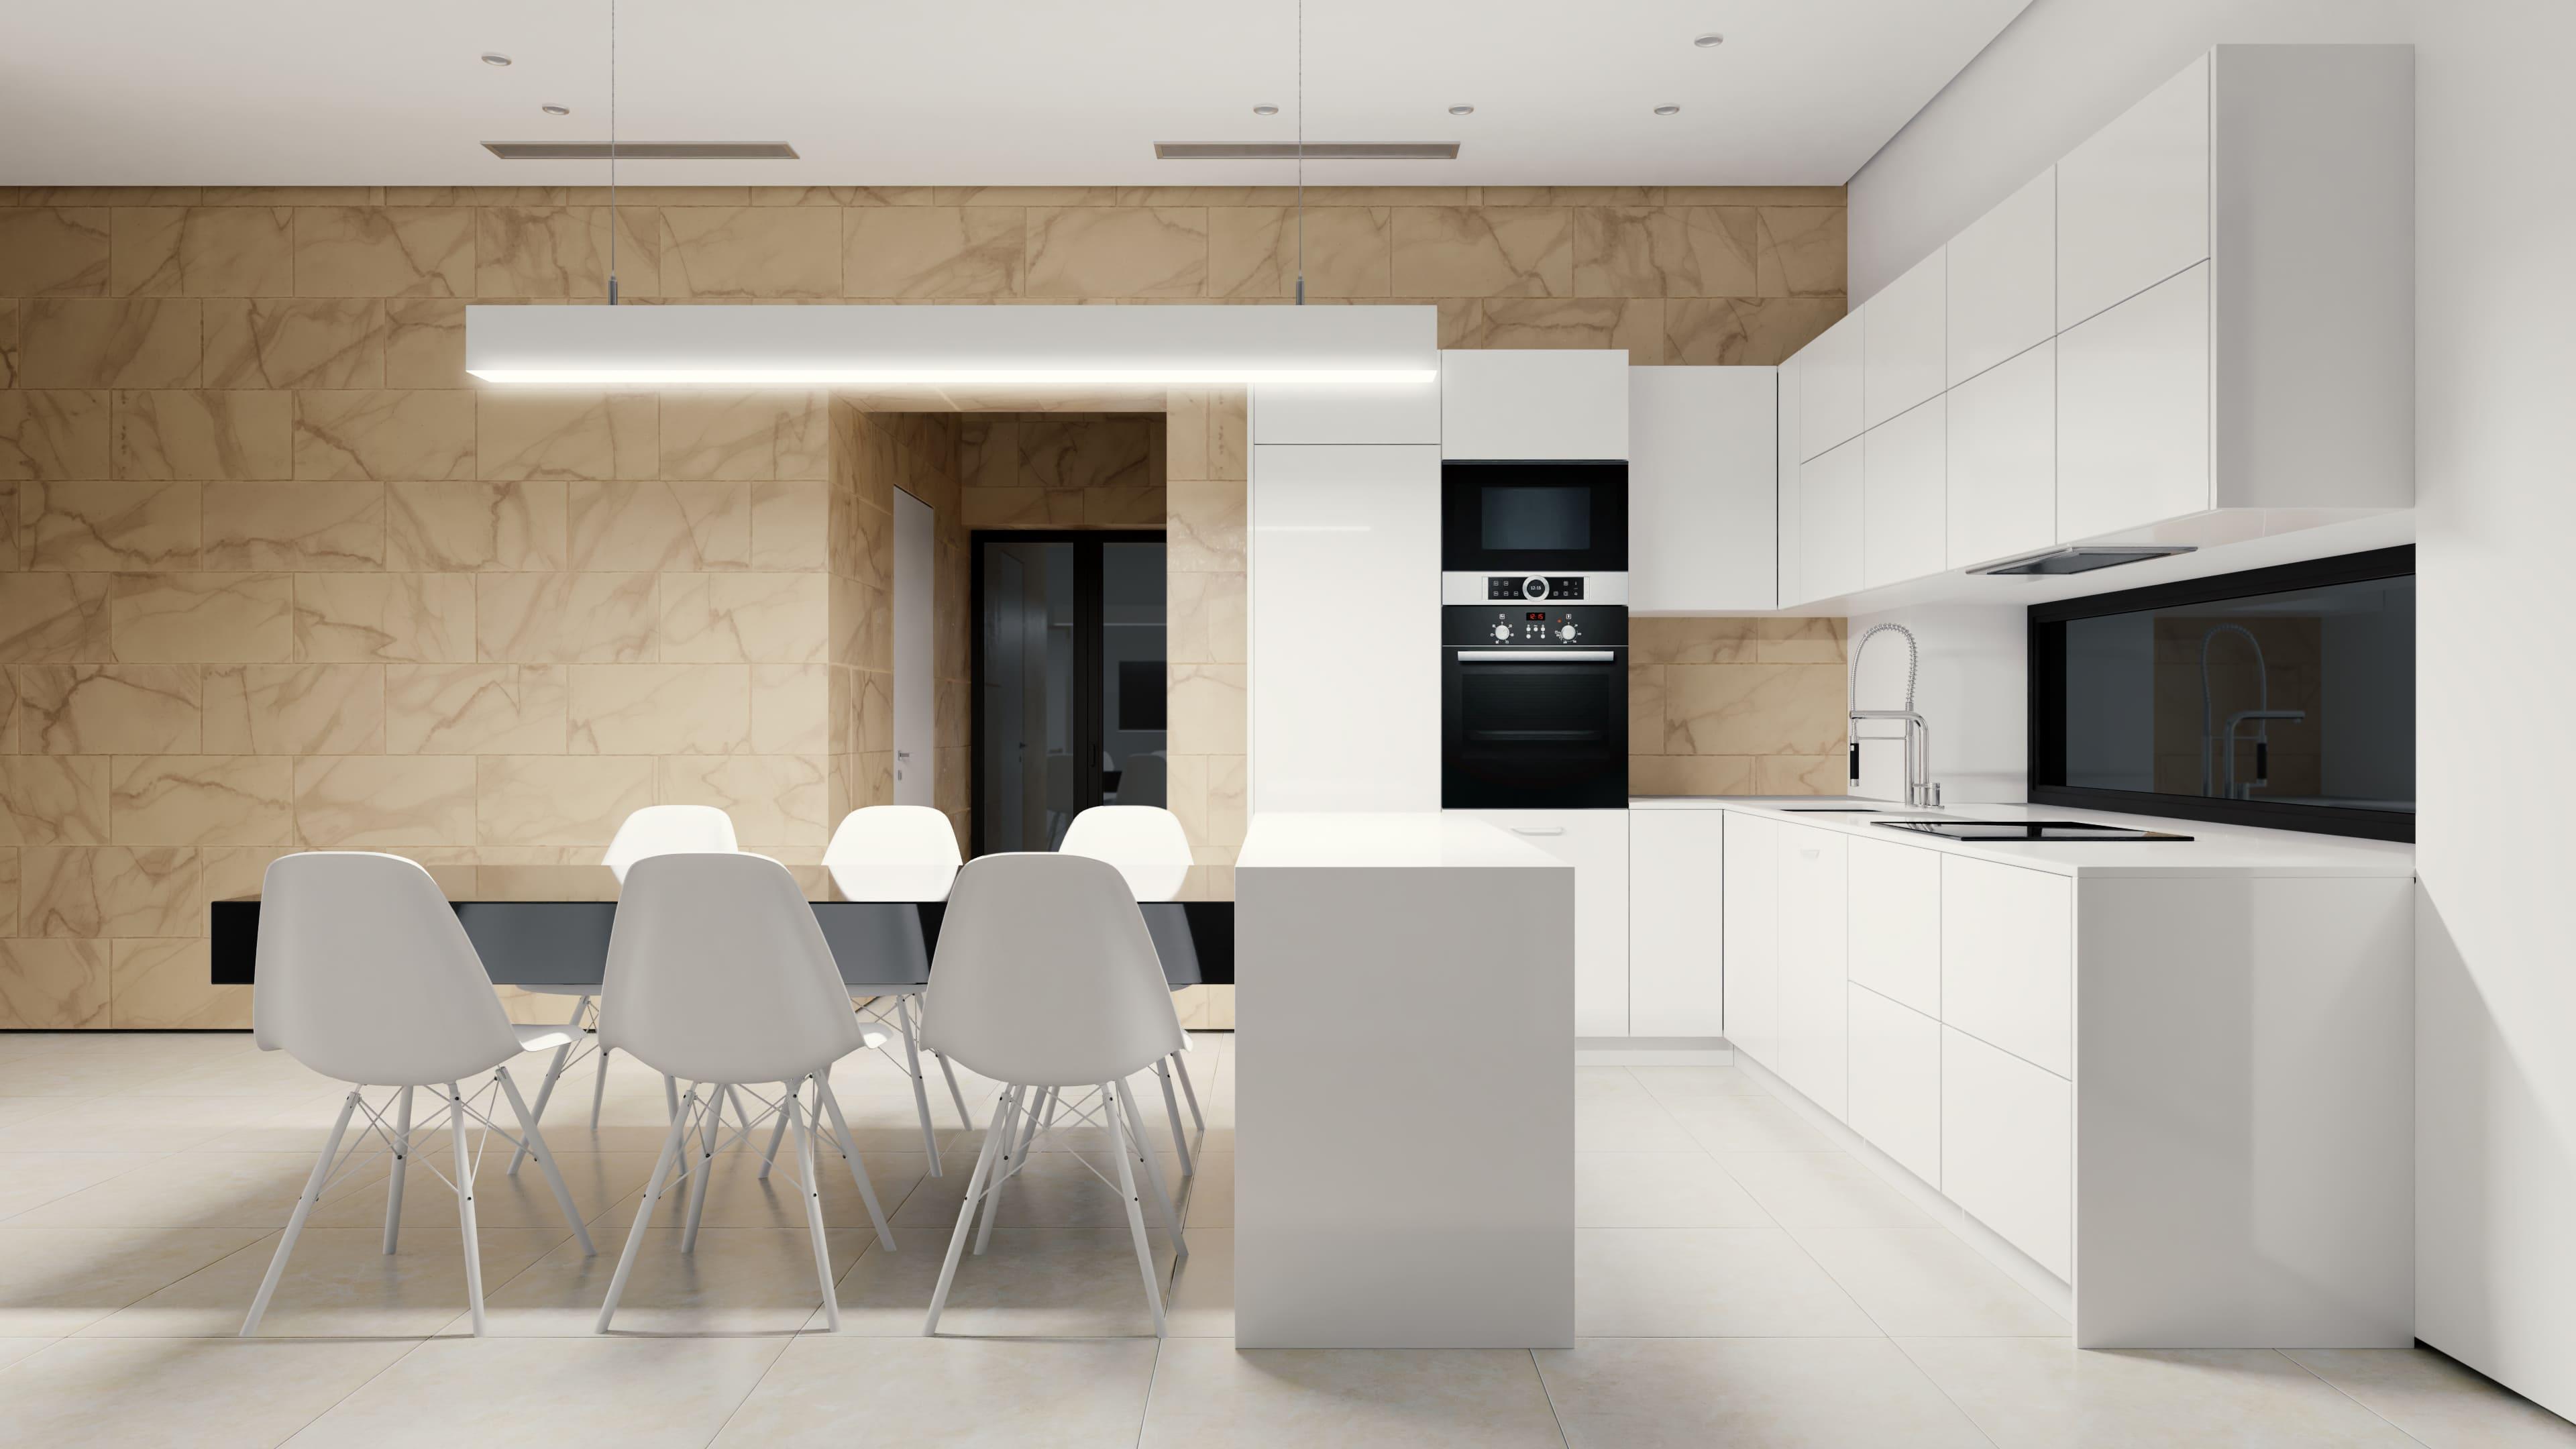 Rendering-3D-Fotorealistico-Interno-24-Rendering-Evolution-Umberto-Oldani